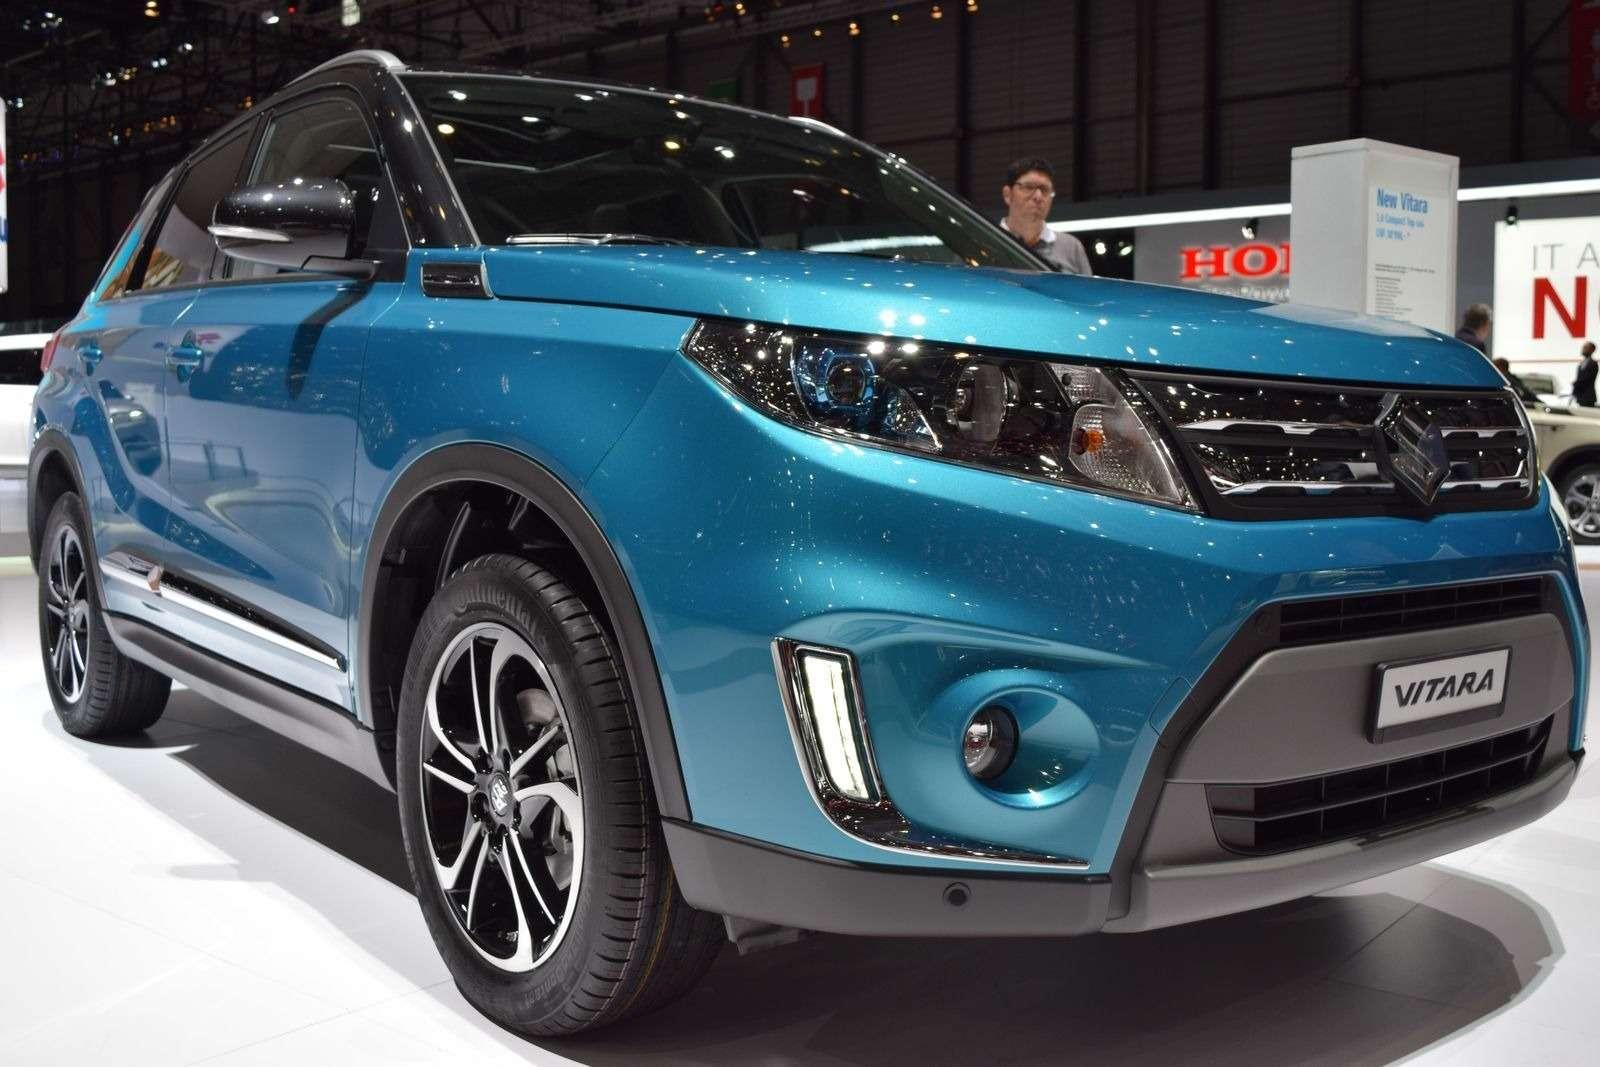 Suzuki предложит новую Vitara вРФпоцене менее 1млн руб.— фото 368907